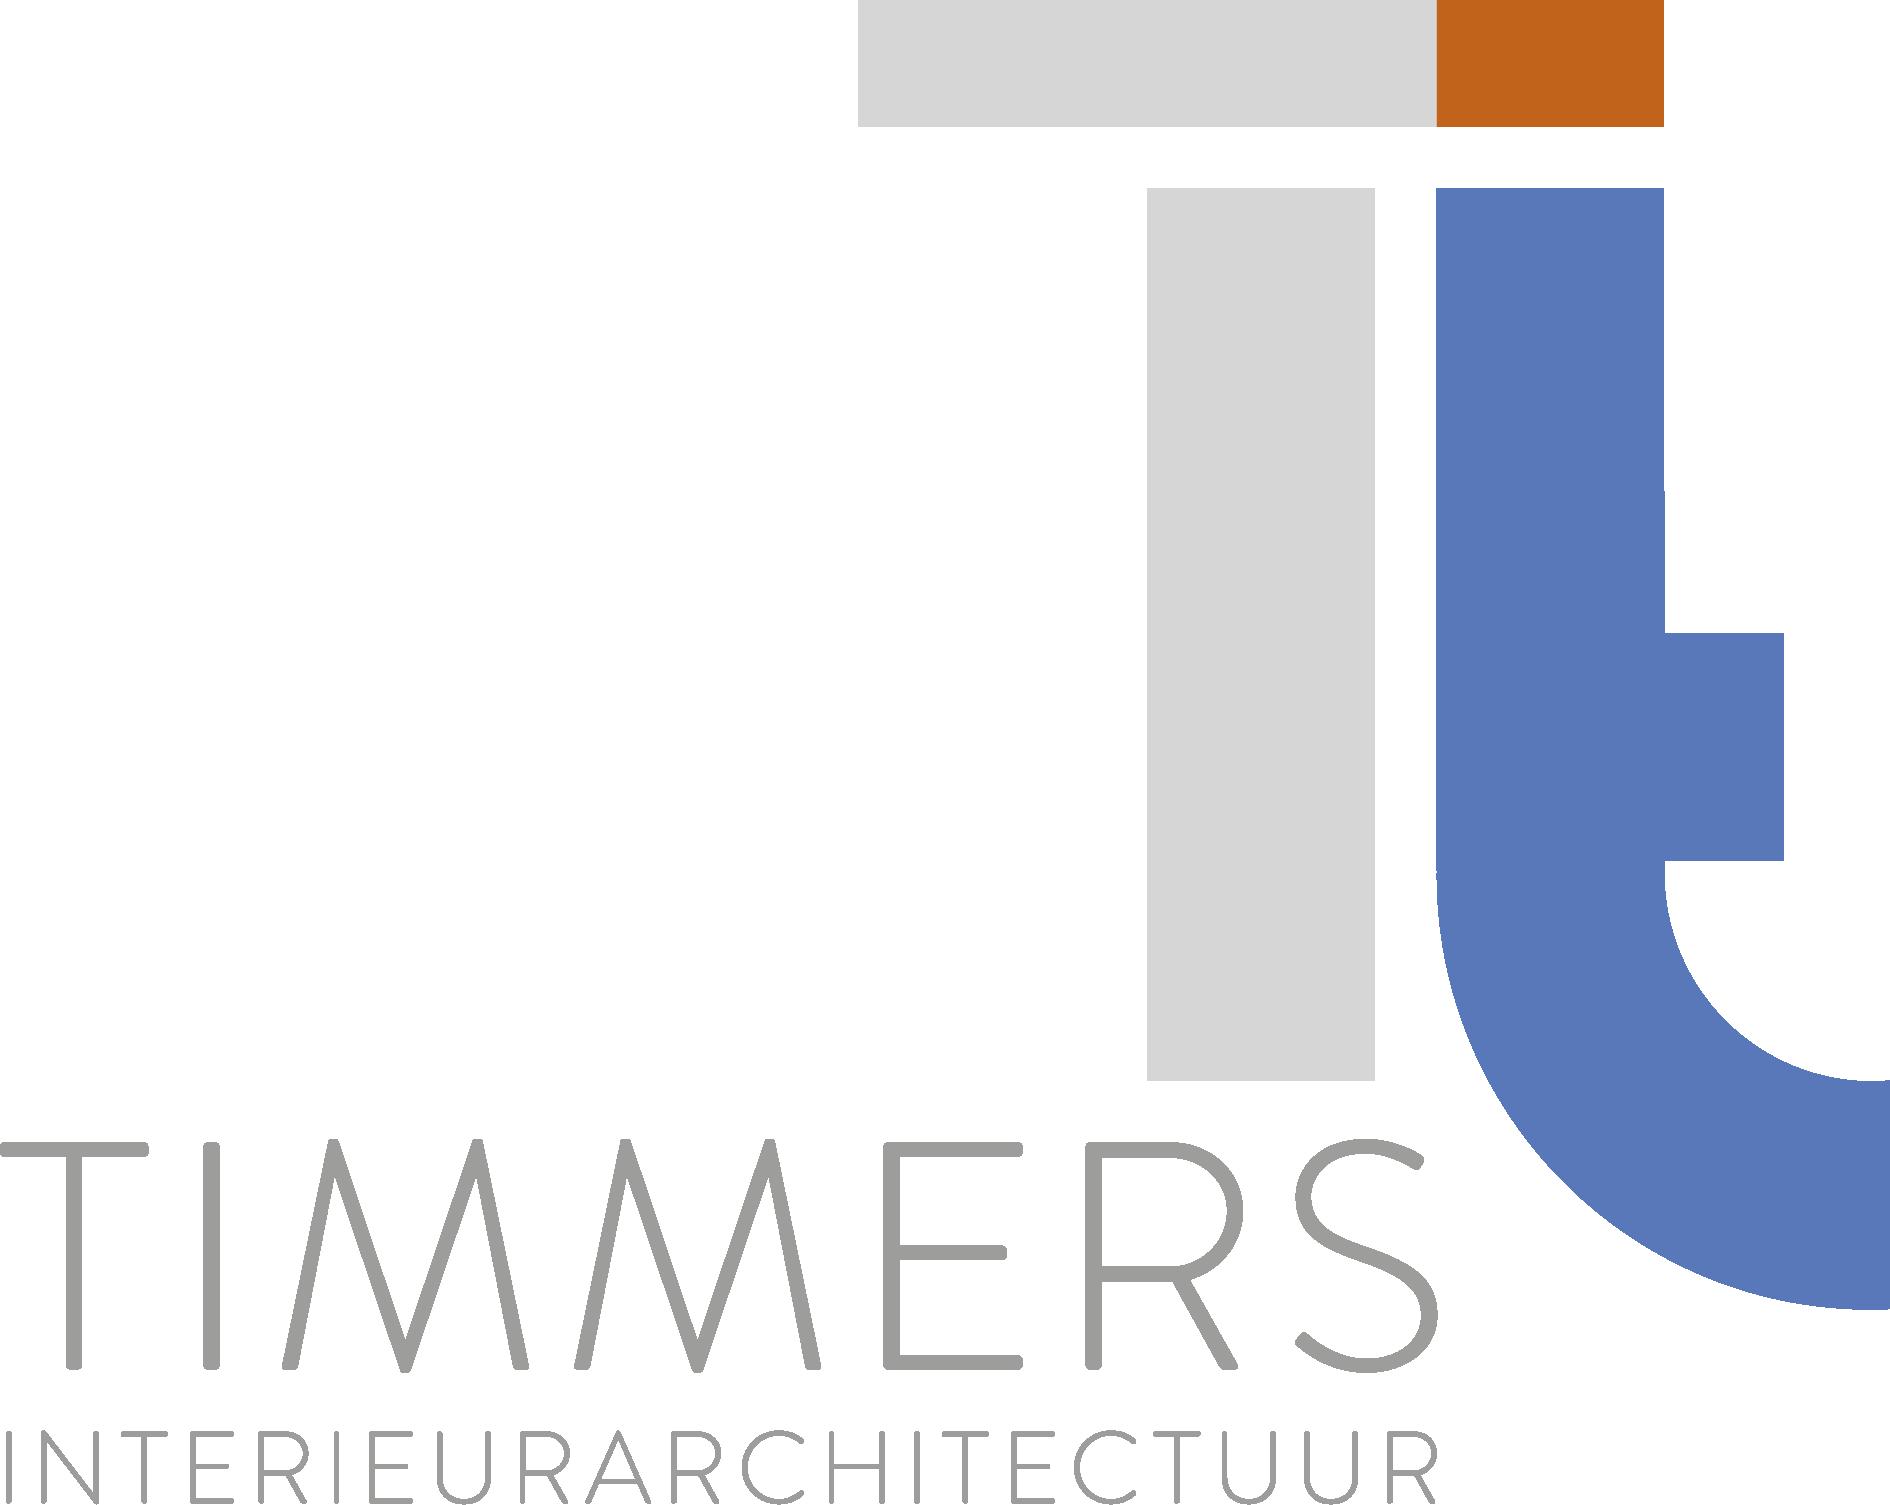 Timmers Interieurarchitectuur logo